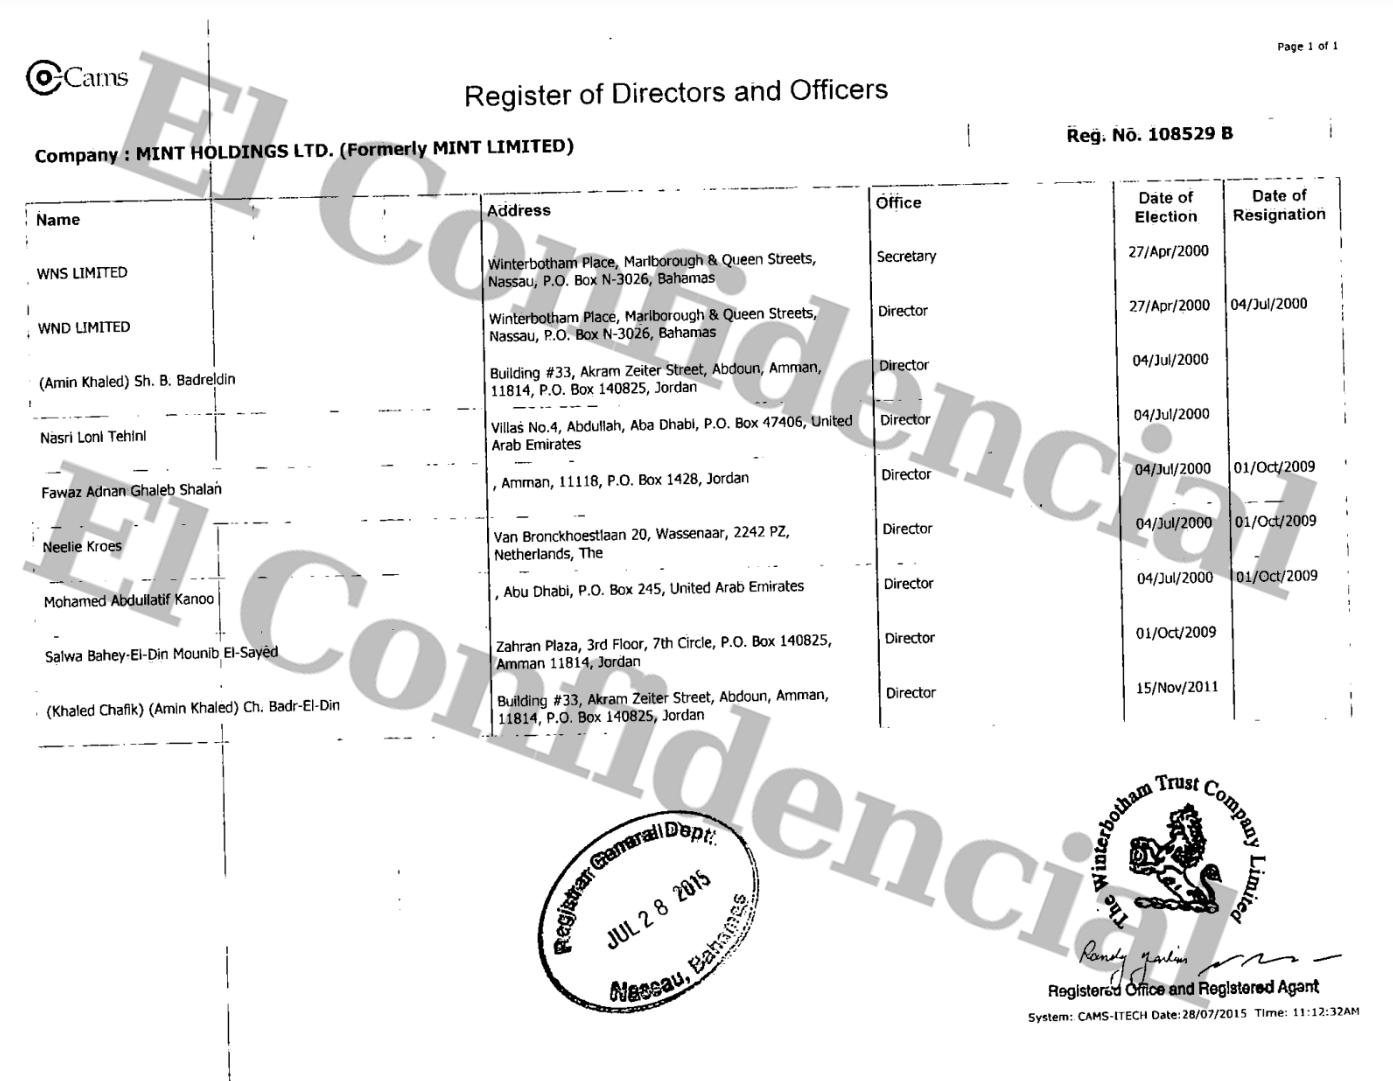 Documento con el registro de Mint Holdings LTD.